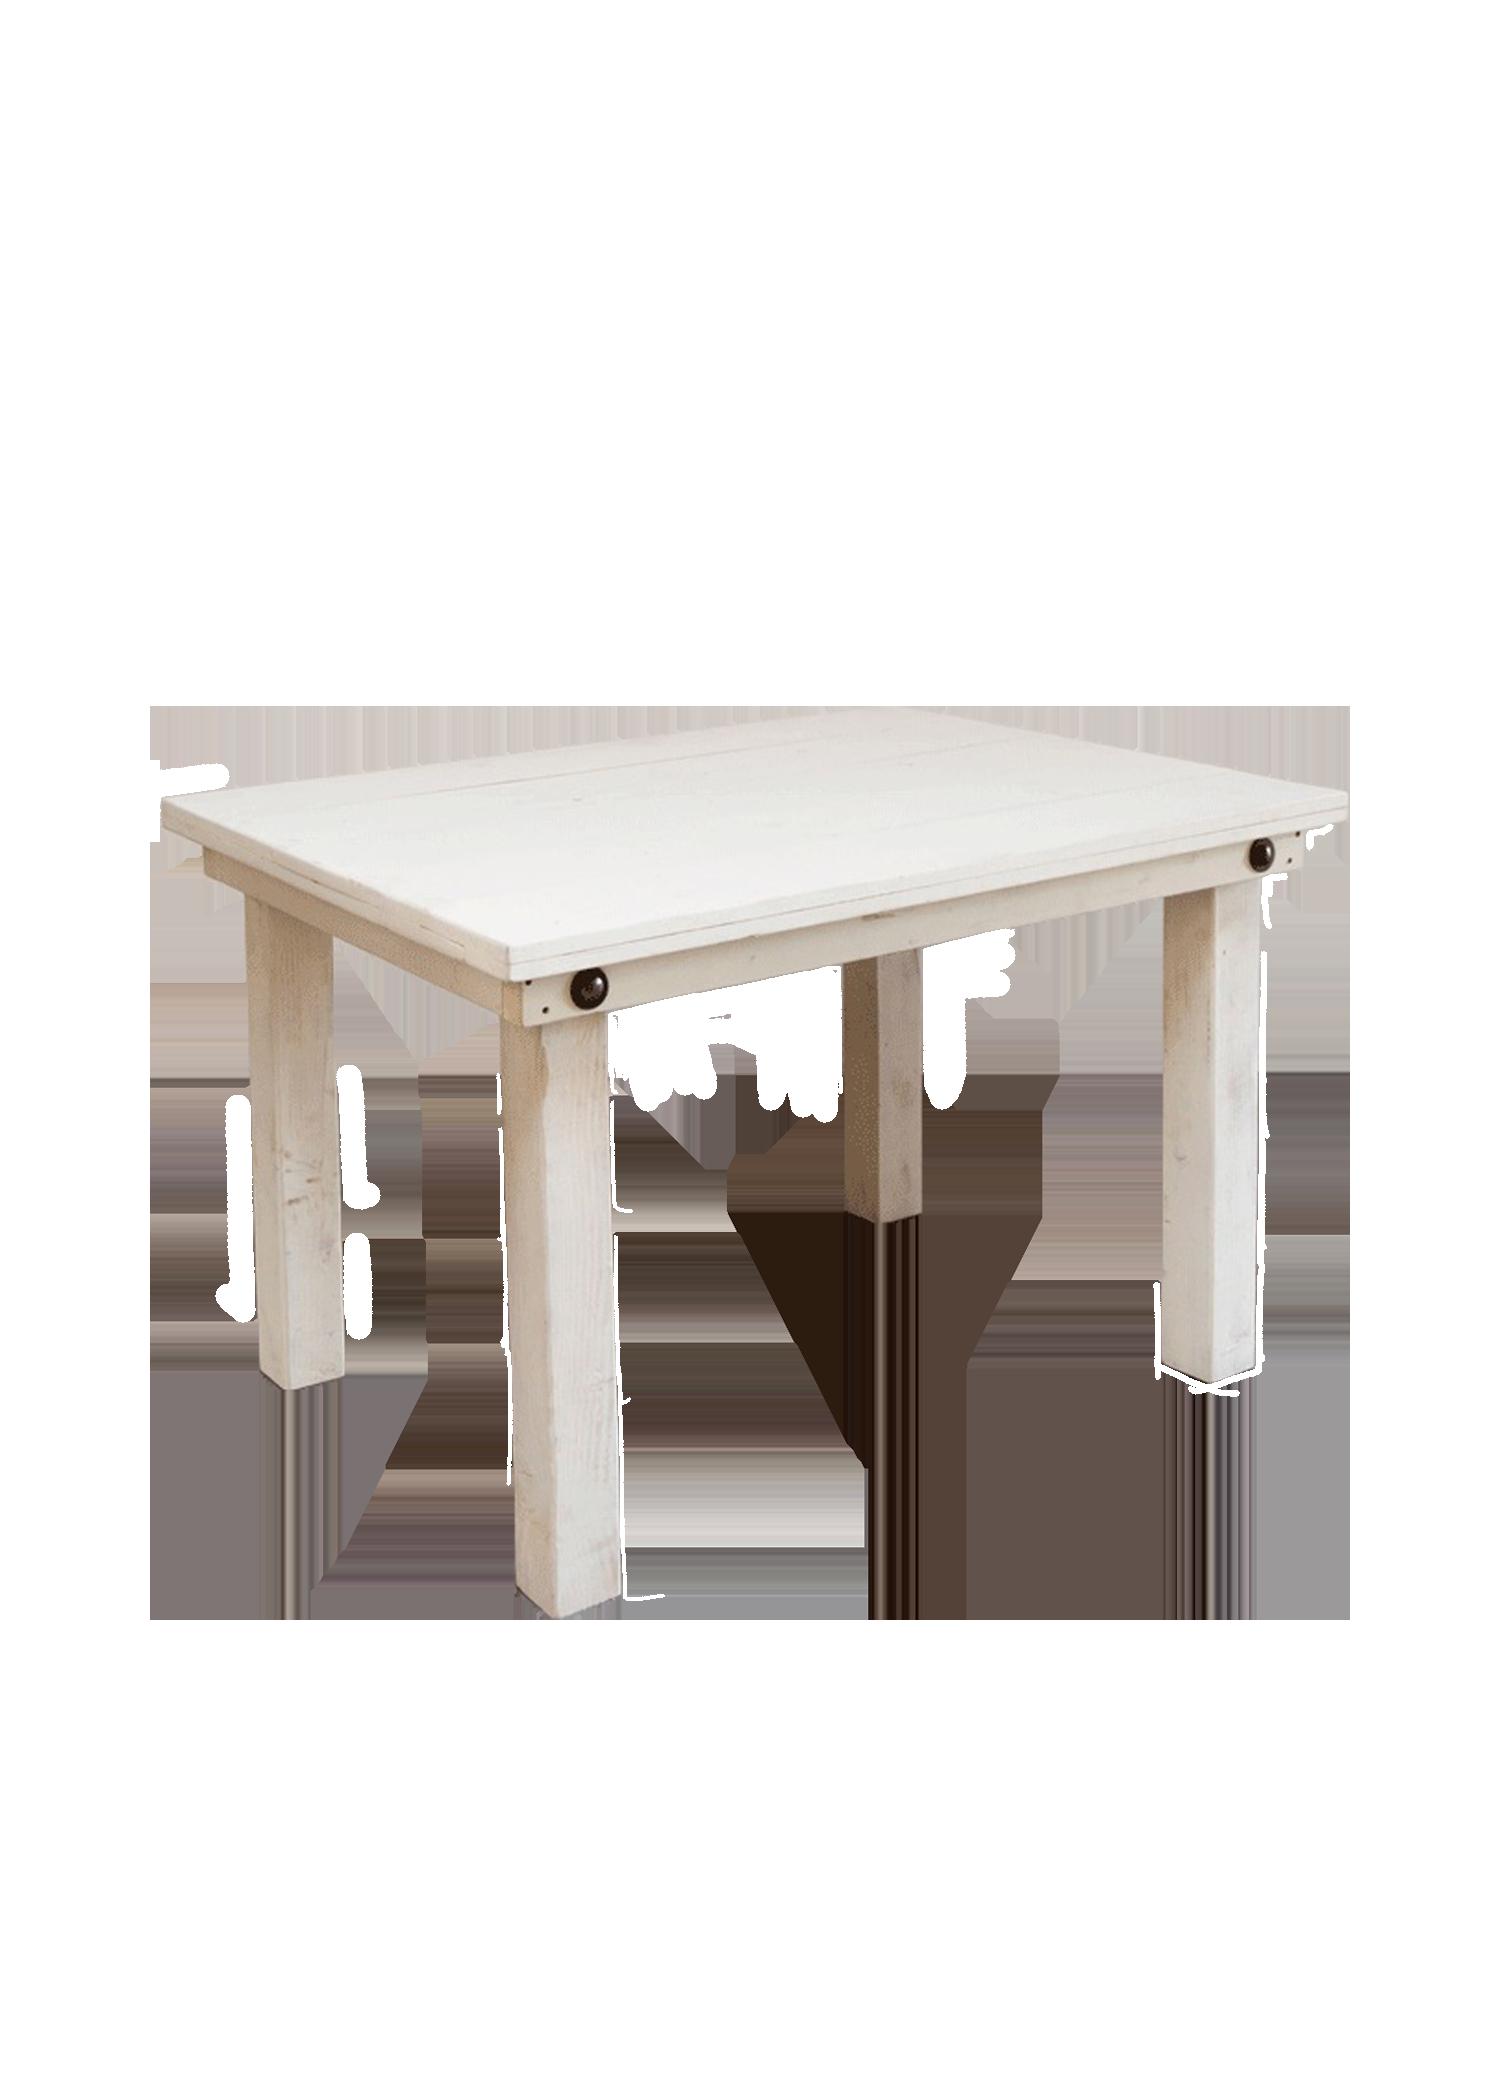 $45 Vintage White 4ft Table (Gift)